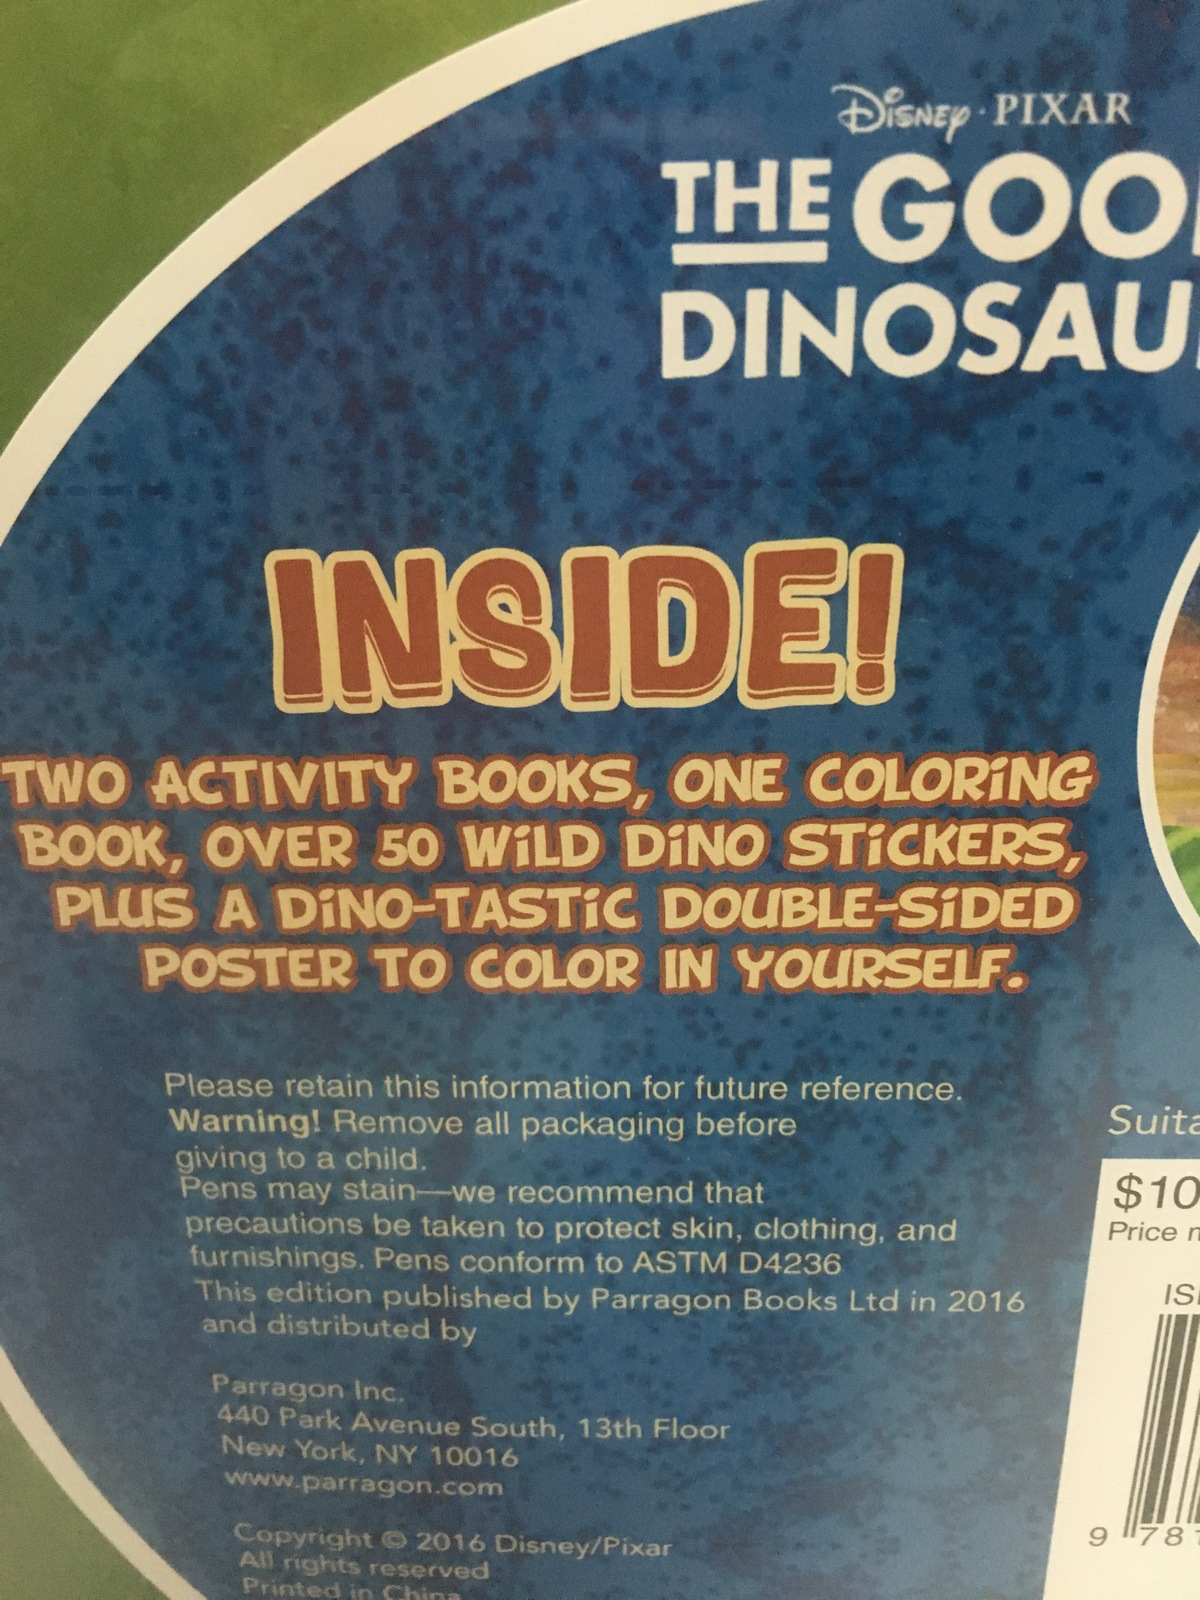 The Good Dinosaur Movie Activity Books & More Graphic Tin Storage